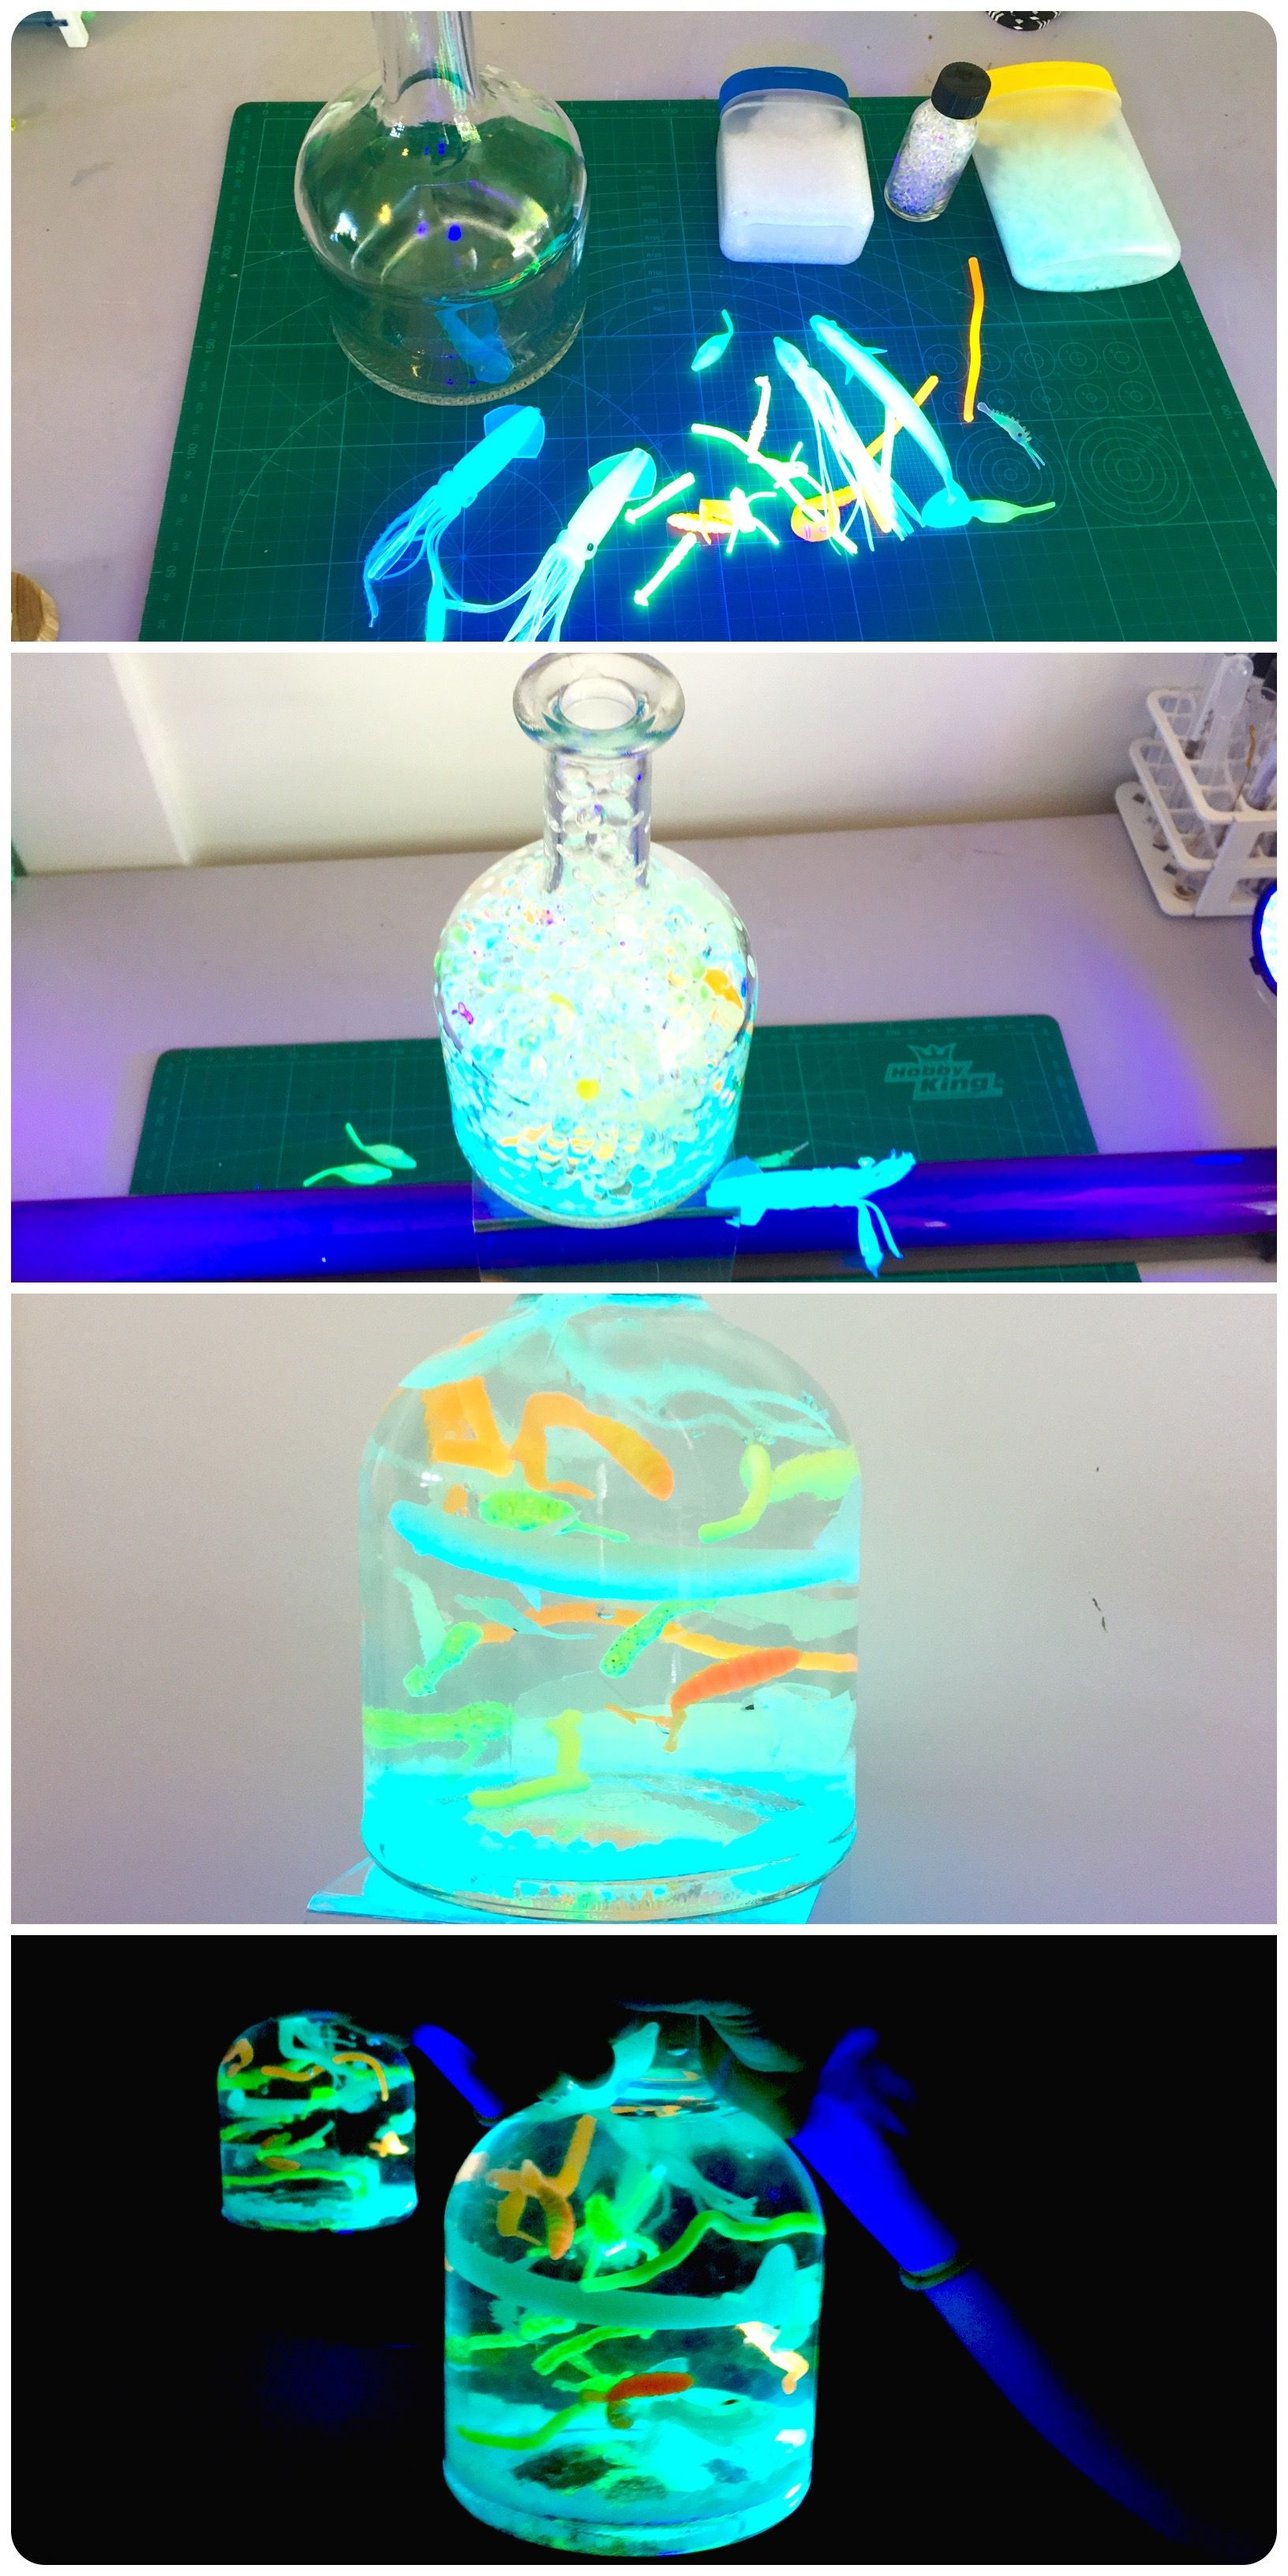 Interesting Variation Of Ocean In A Bottle Discovery Bottle Glow In The Dark Ocean Creatures In A Bottle Https Discovery Bottles Bottle Lamp Glow